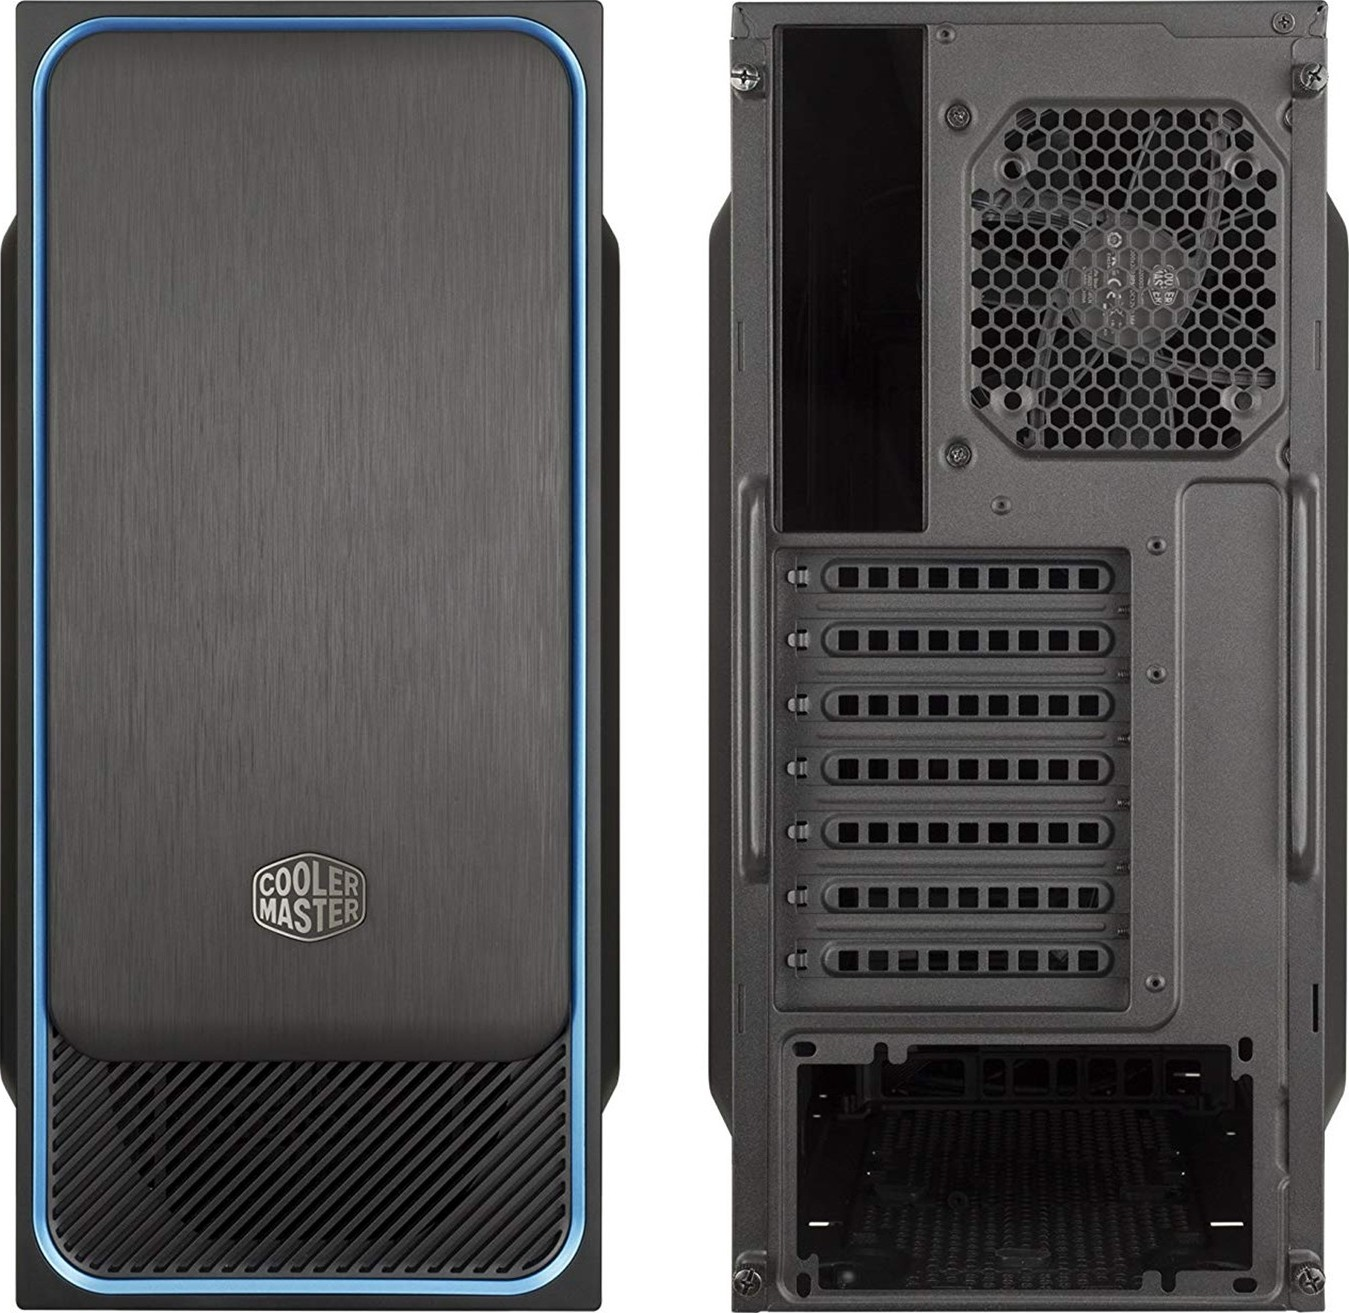 Cooler Master Masterbox E500l Acrylic Side Panel Atx Mid